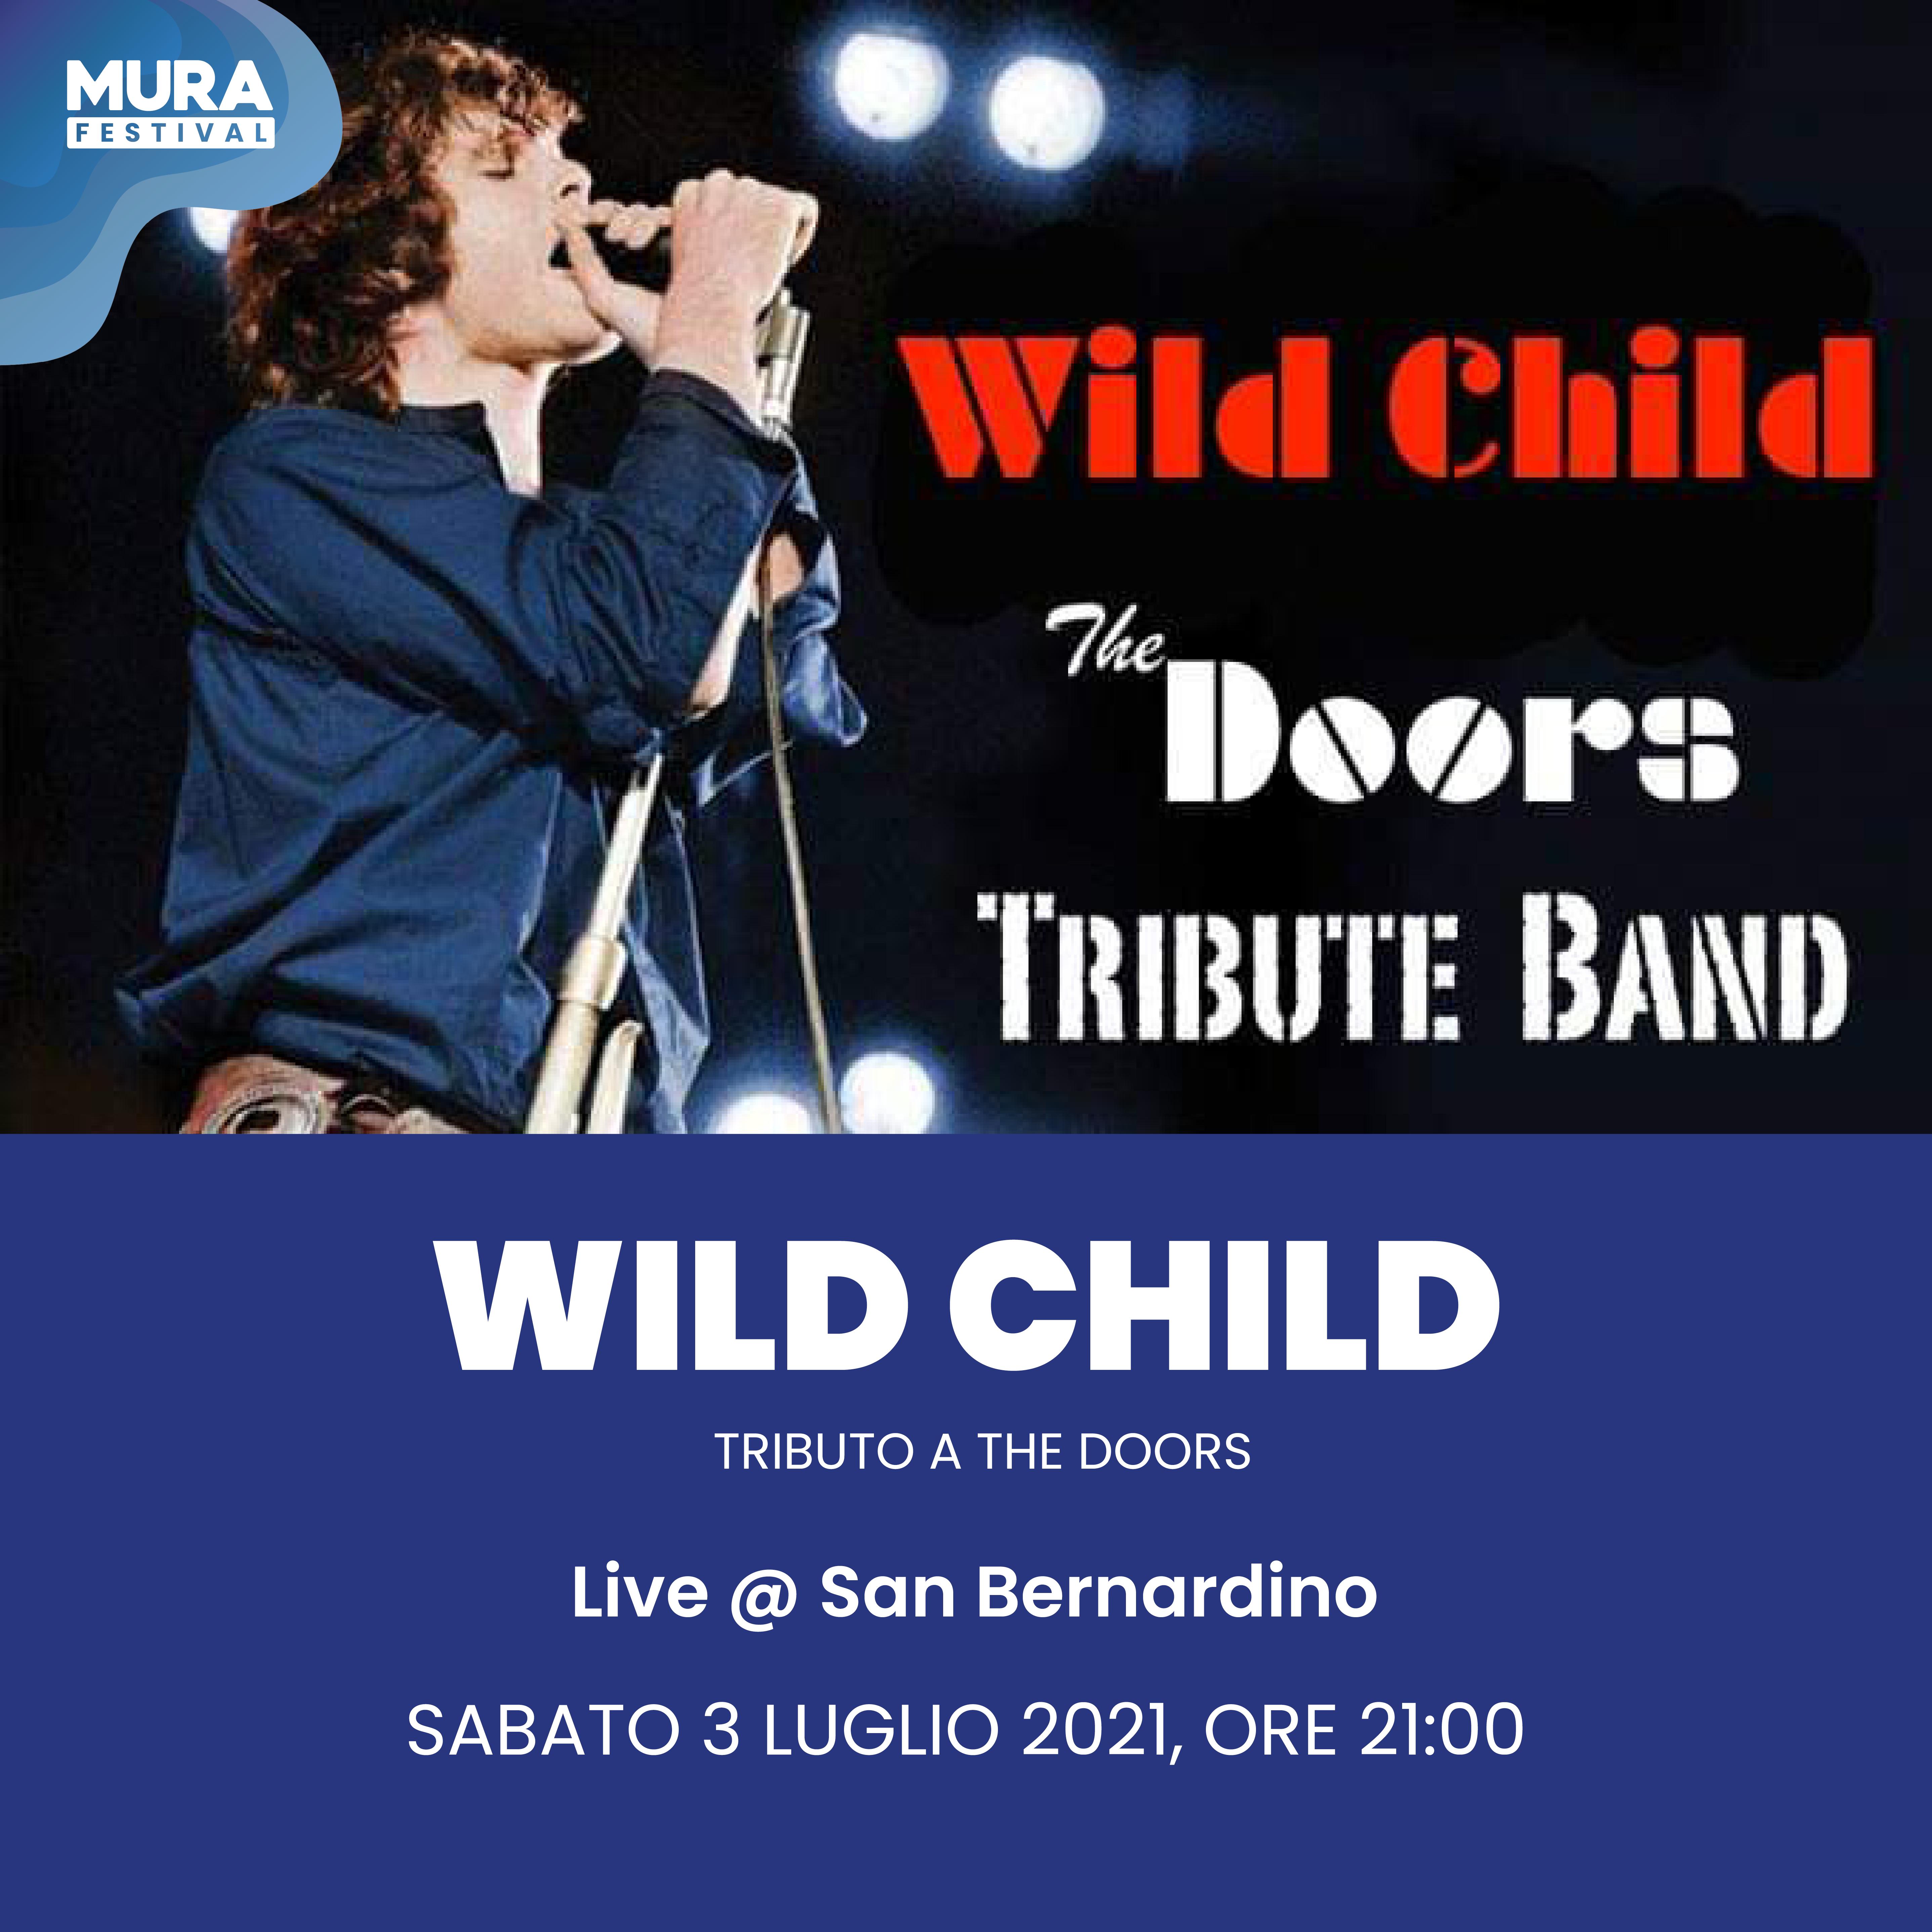 Wild Child - Mura Festival